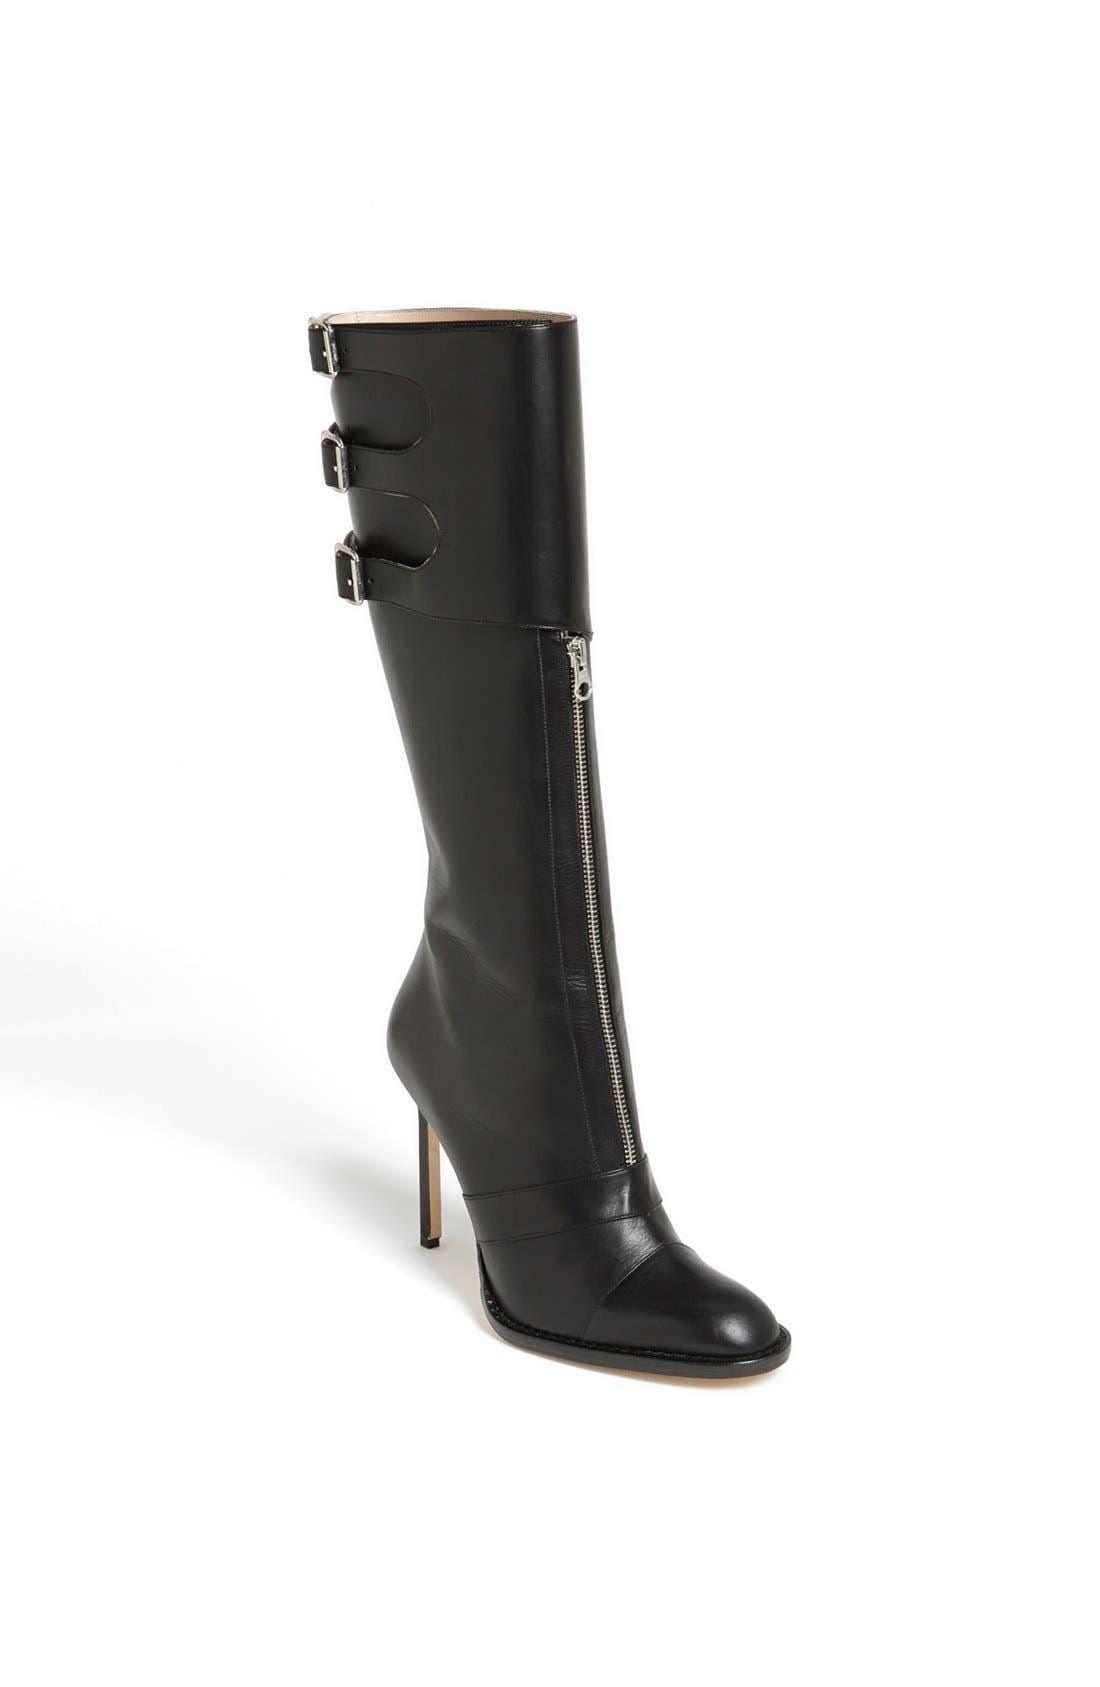 Main Image - Manolo Blahnik Tall Leather Boot